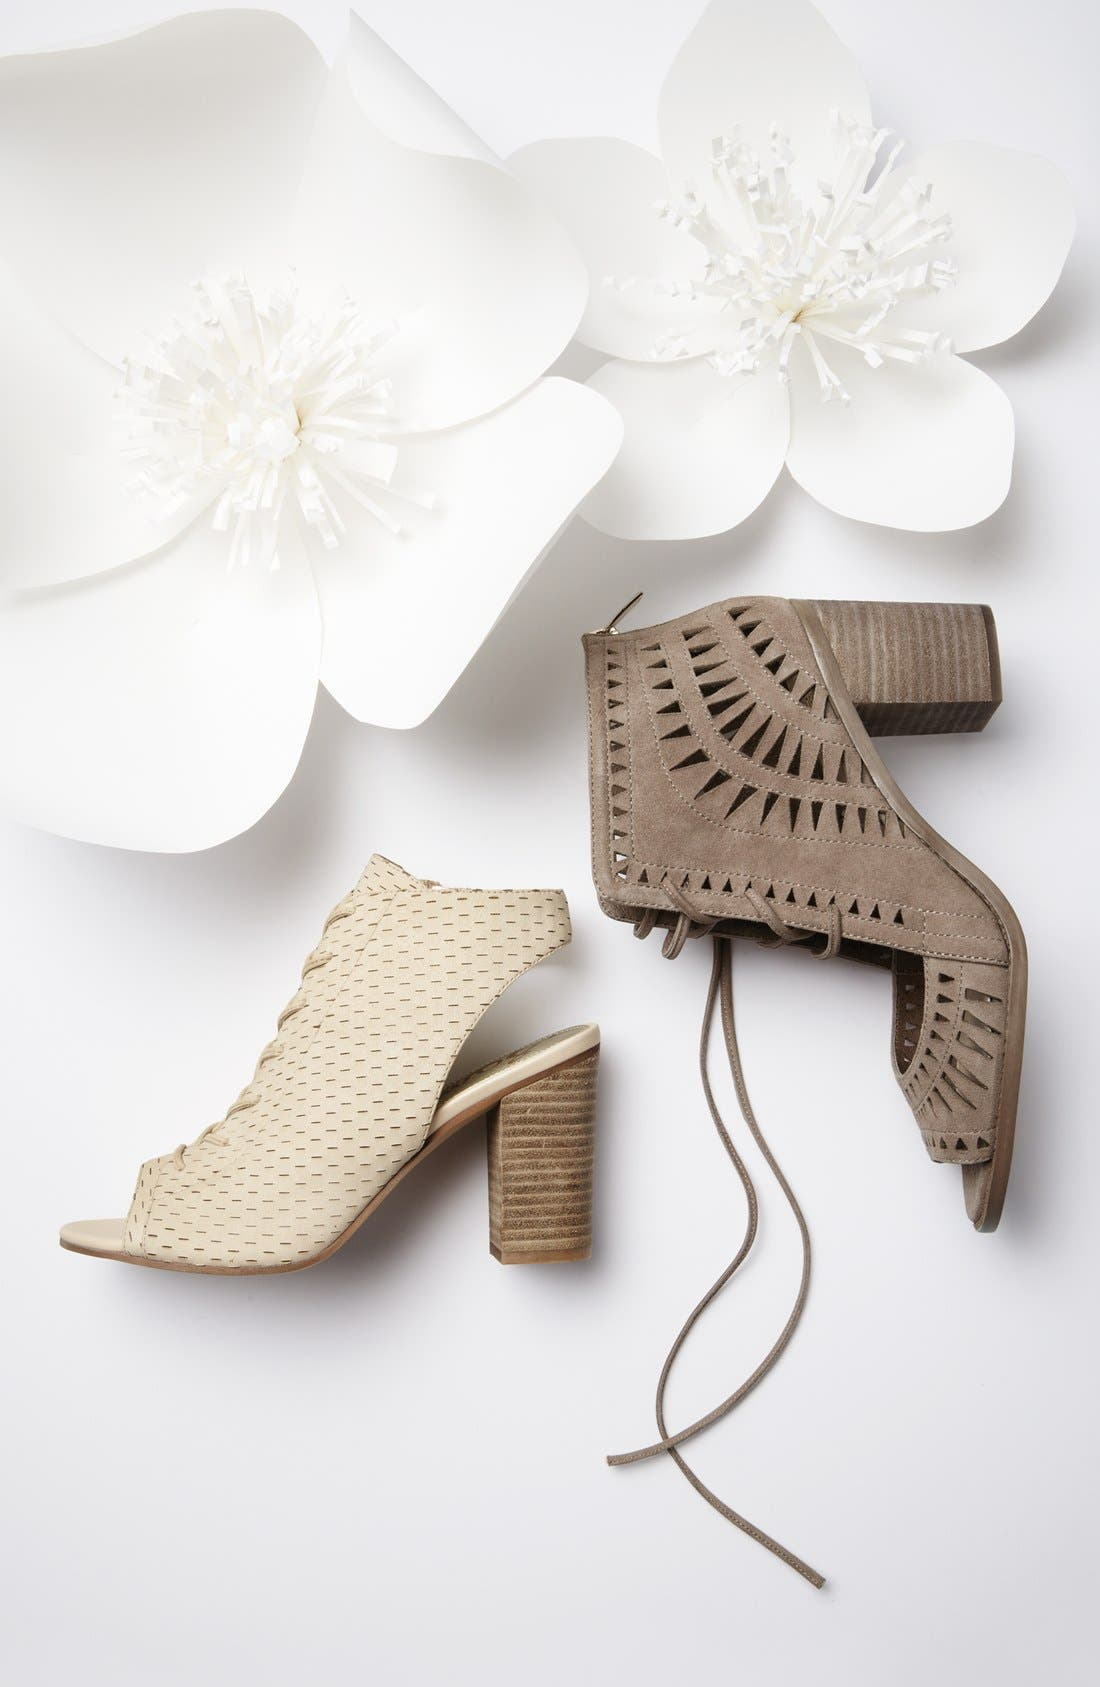 VINCE CAMUTO 'Tarita' Cutout Lace-Up Sandal, Main, color, 600